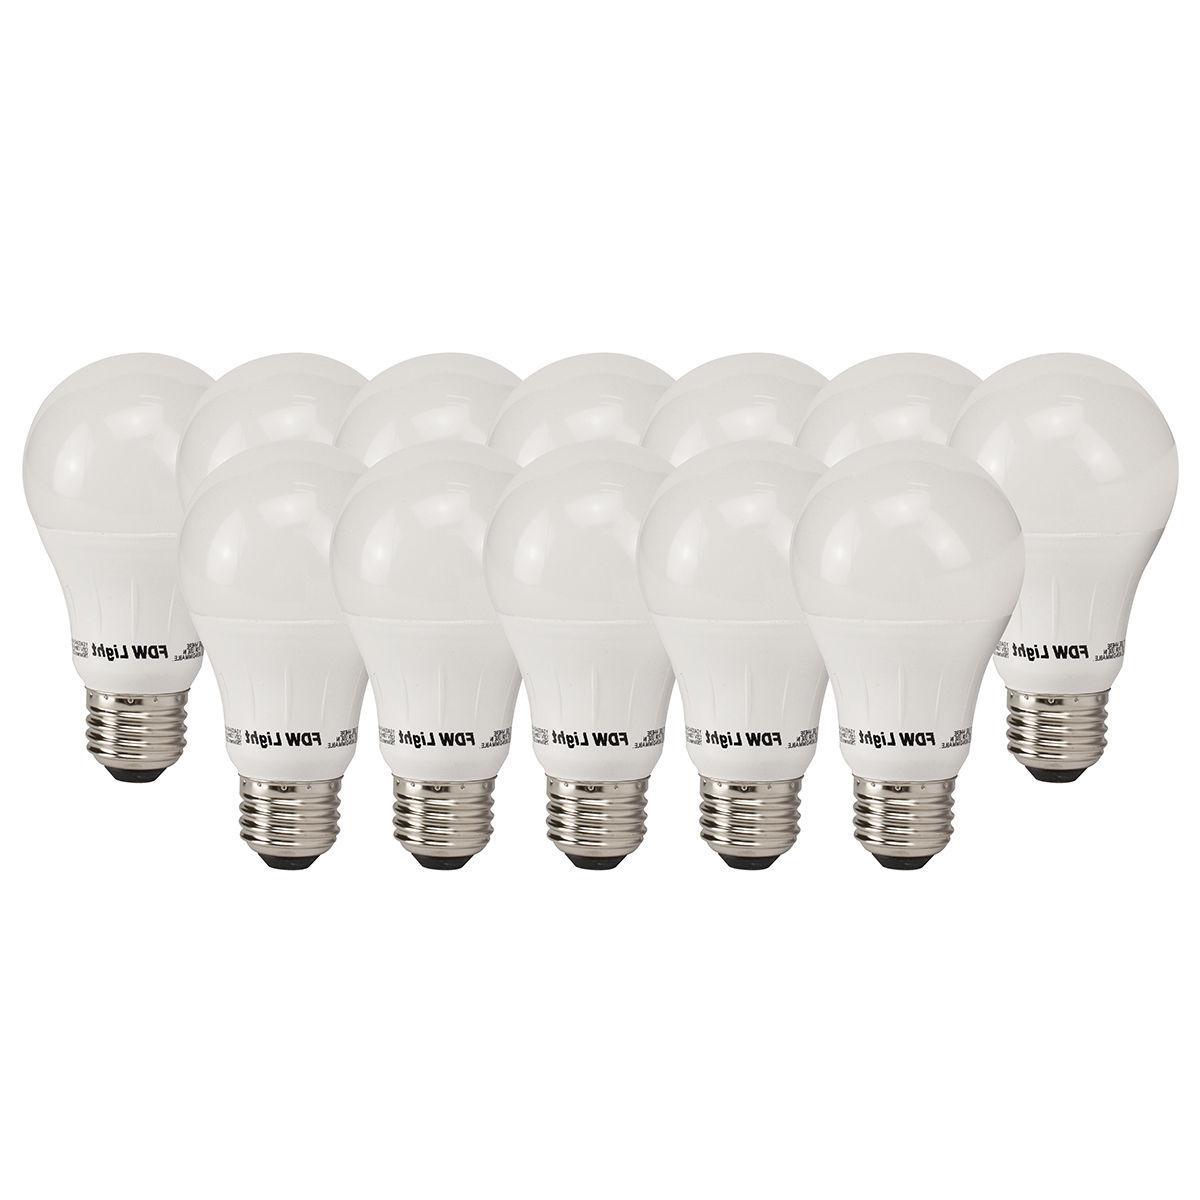 New Watt SlimStyle Bulb Soft White 12 60W